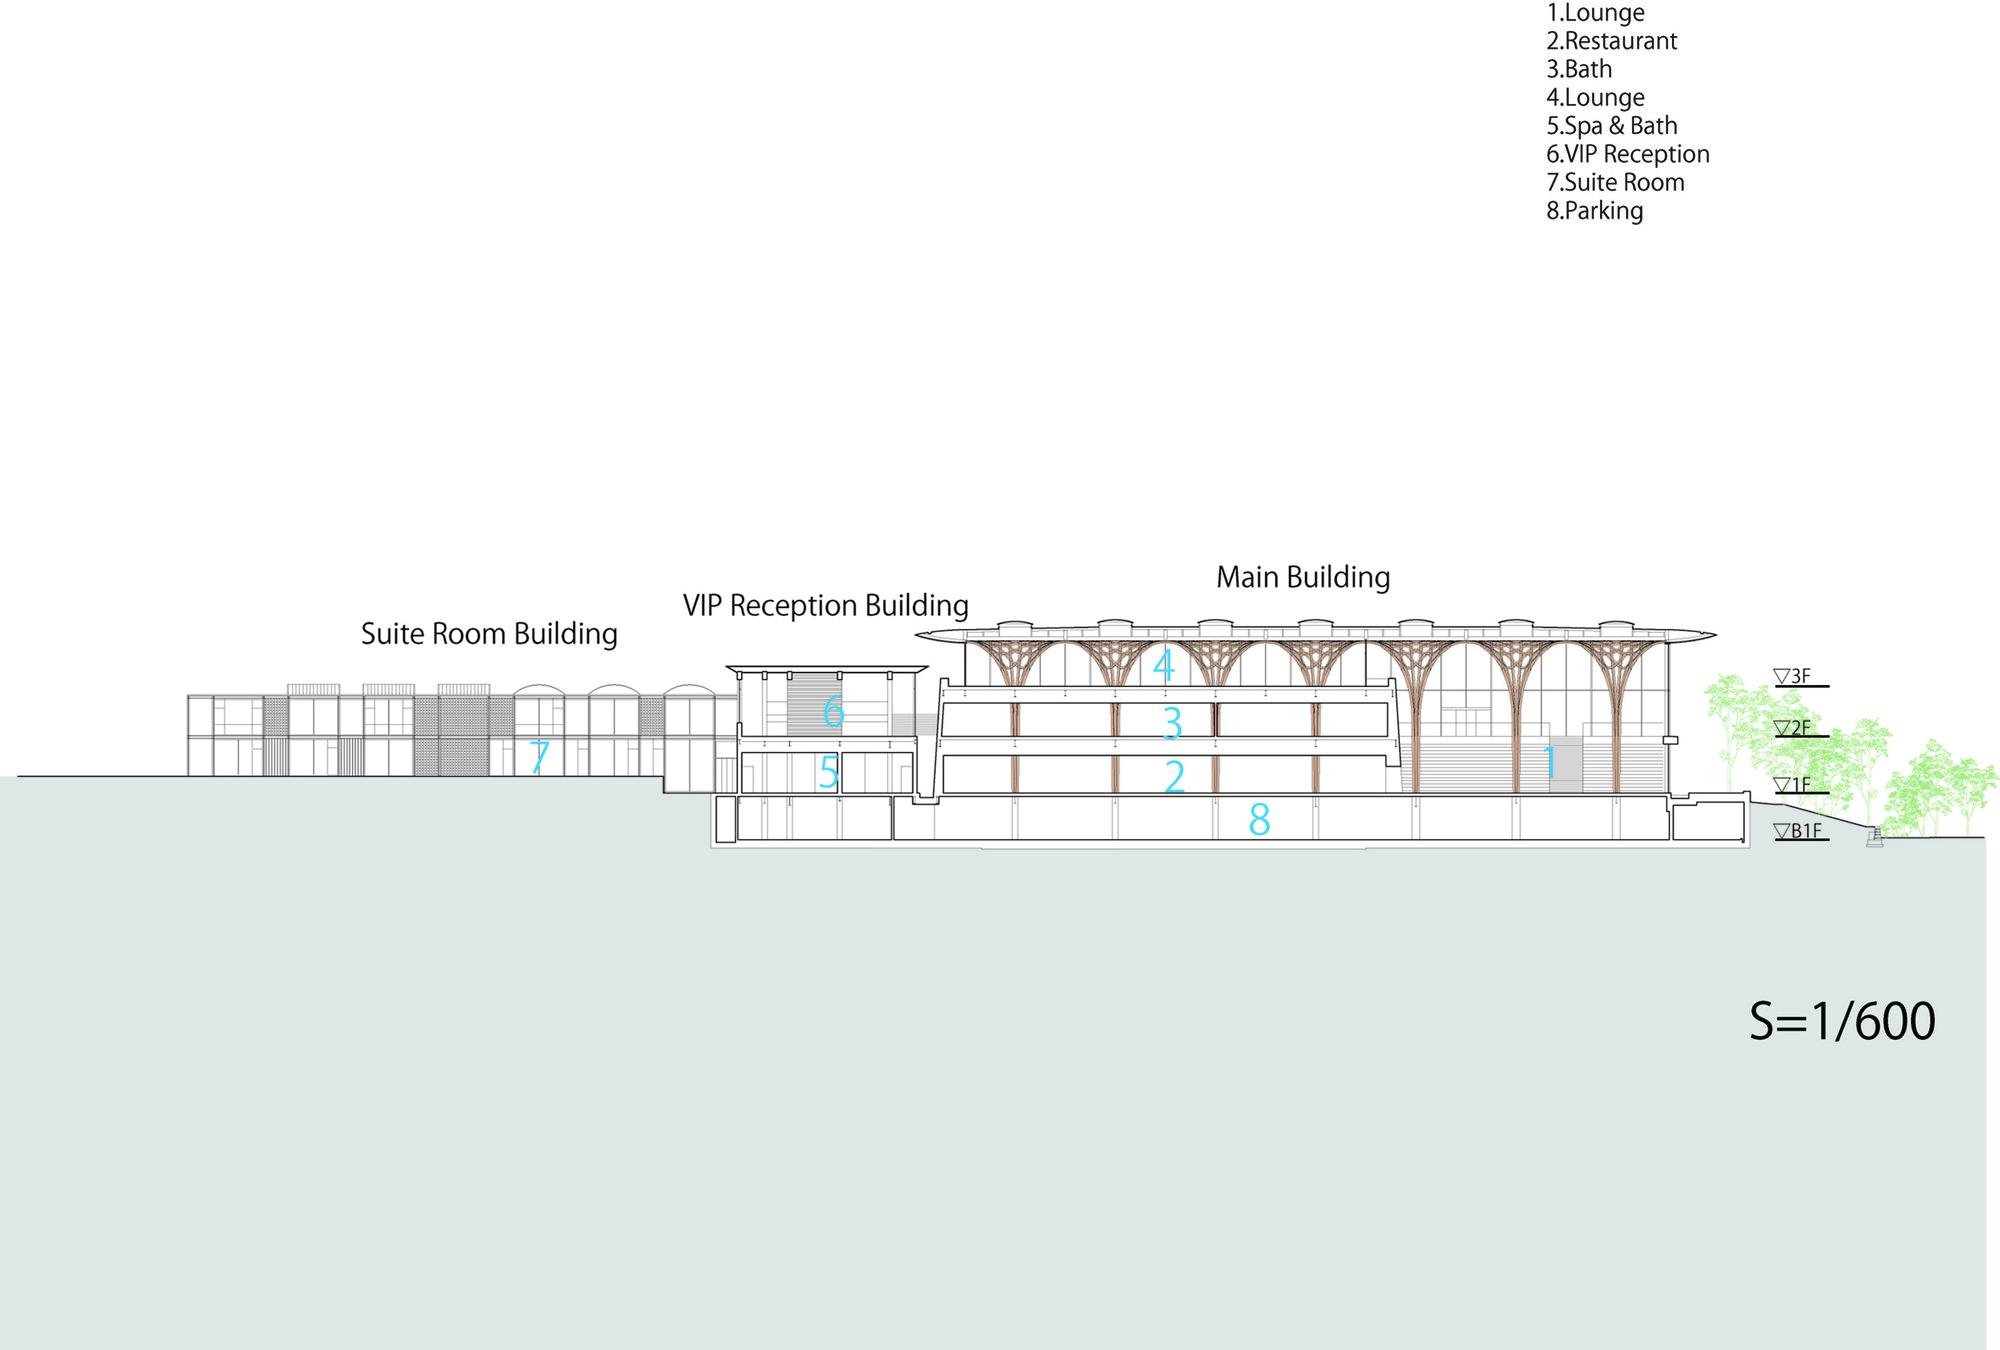 Gallery Floor Plans Gallery Of Nine Bridges Country Club Shigeru Ban